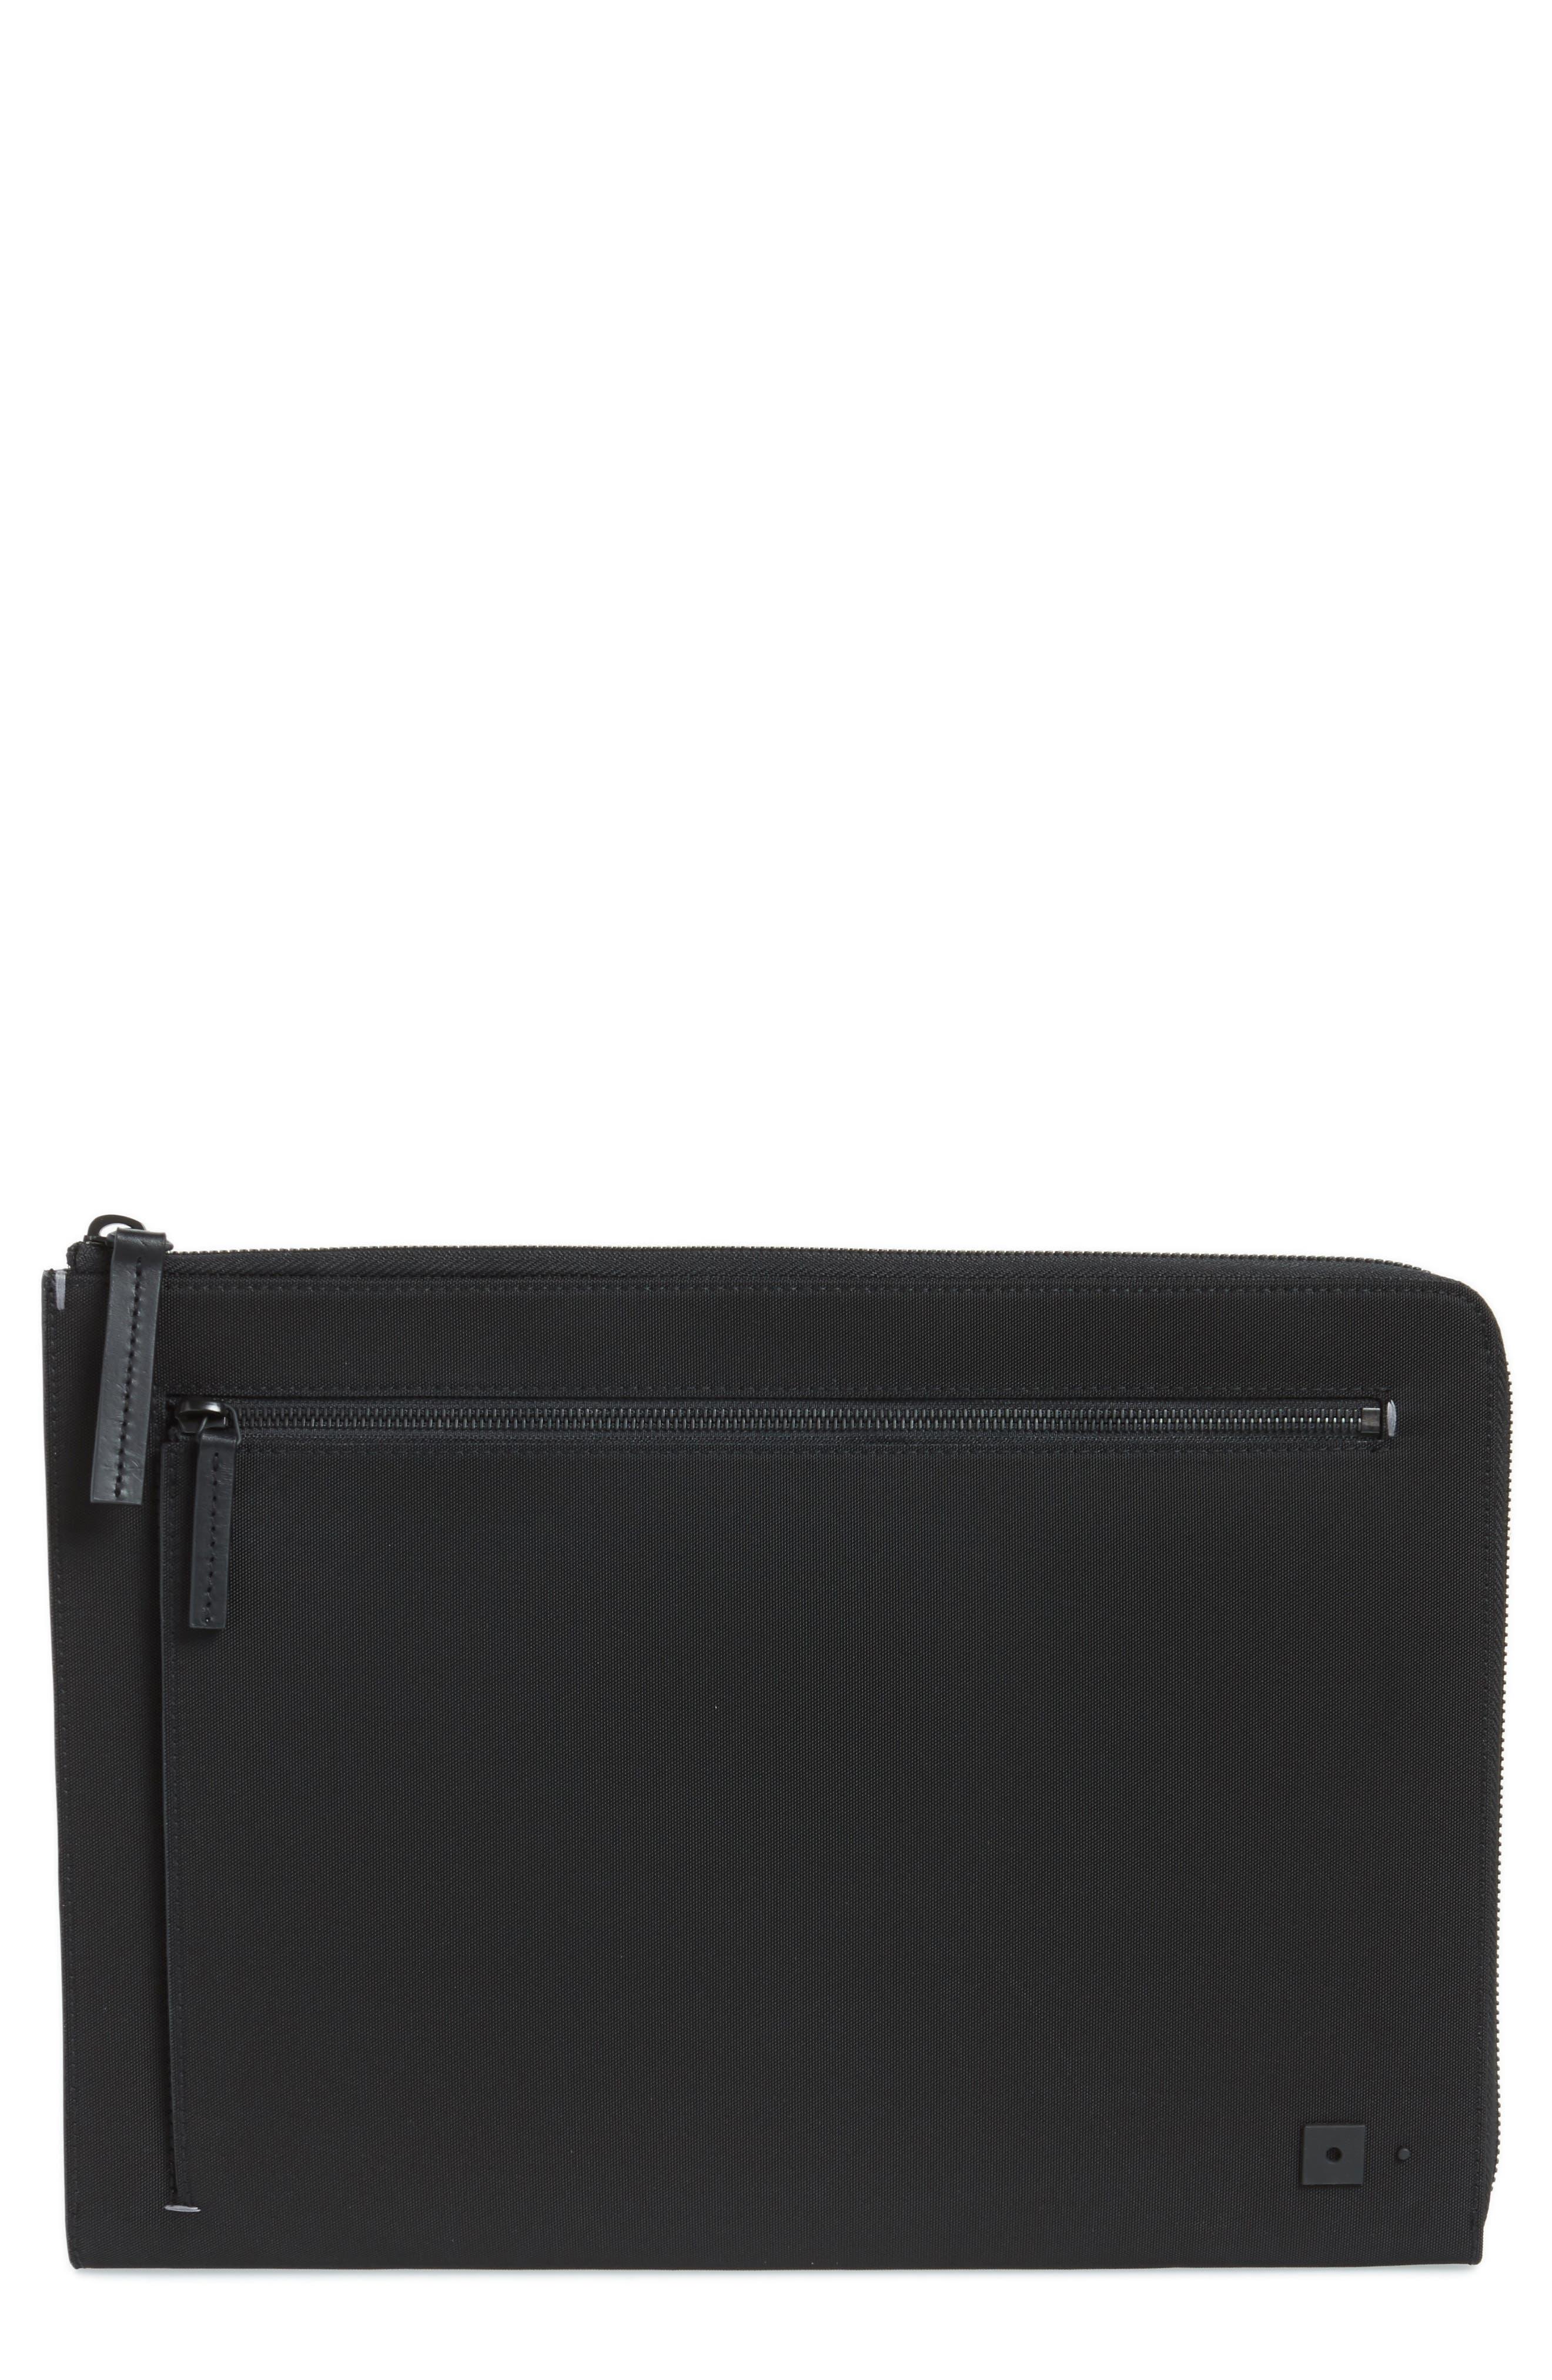 Portfolio Case,                         Main,                         color, Black Nylon/ Black Leather